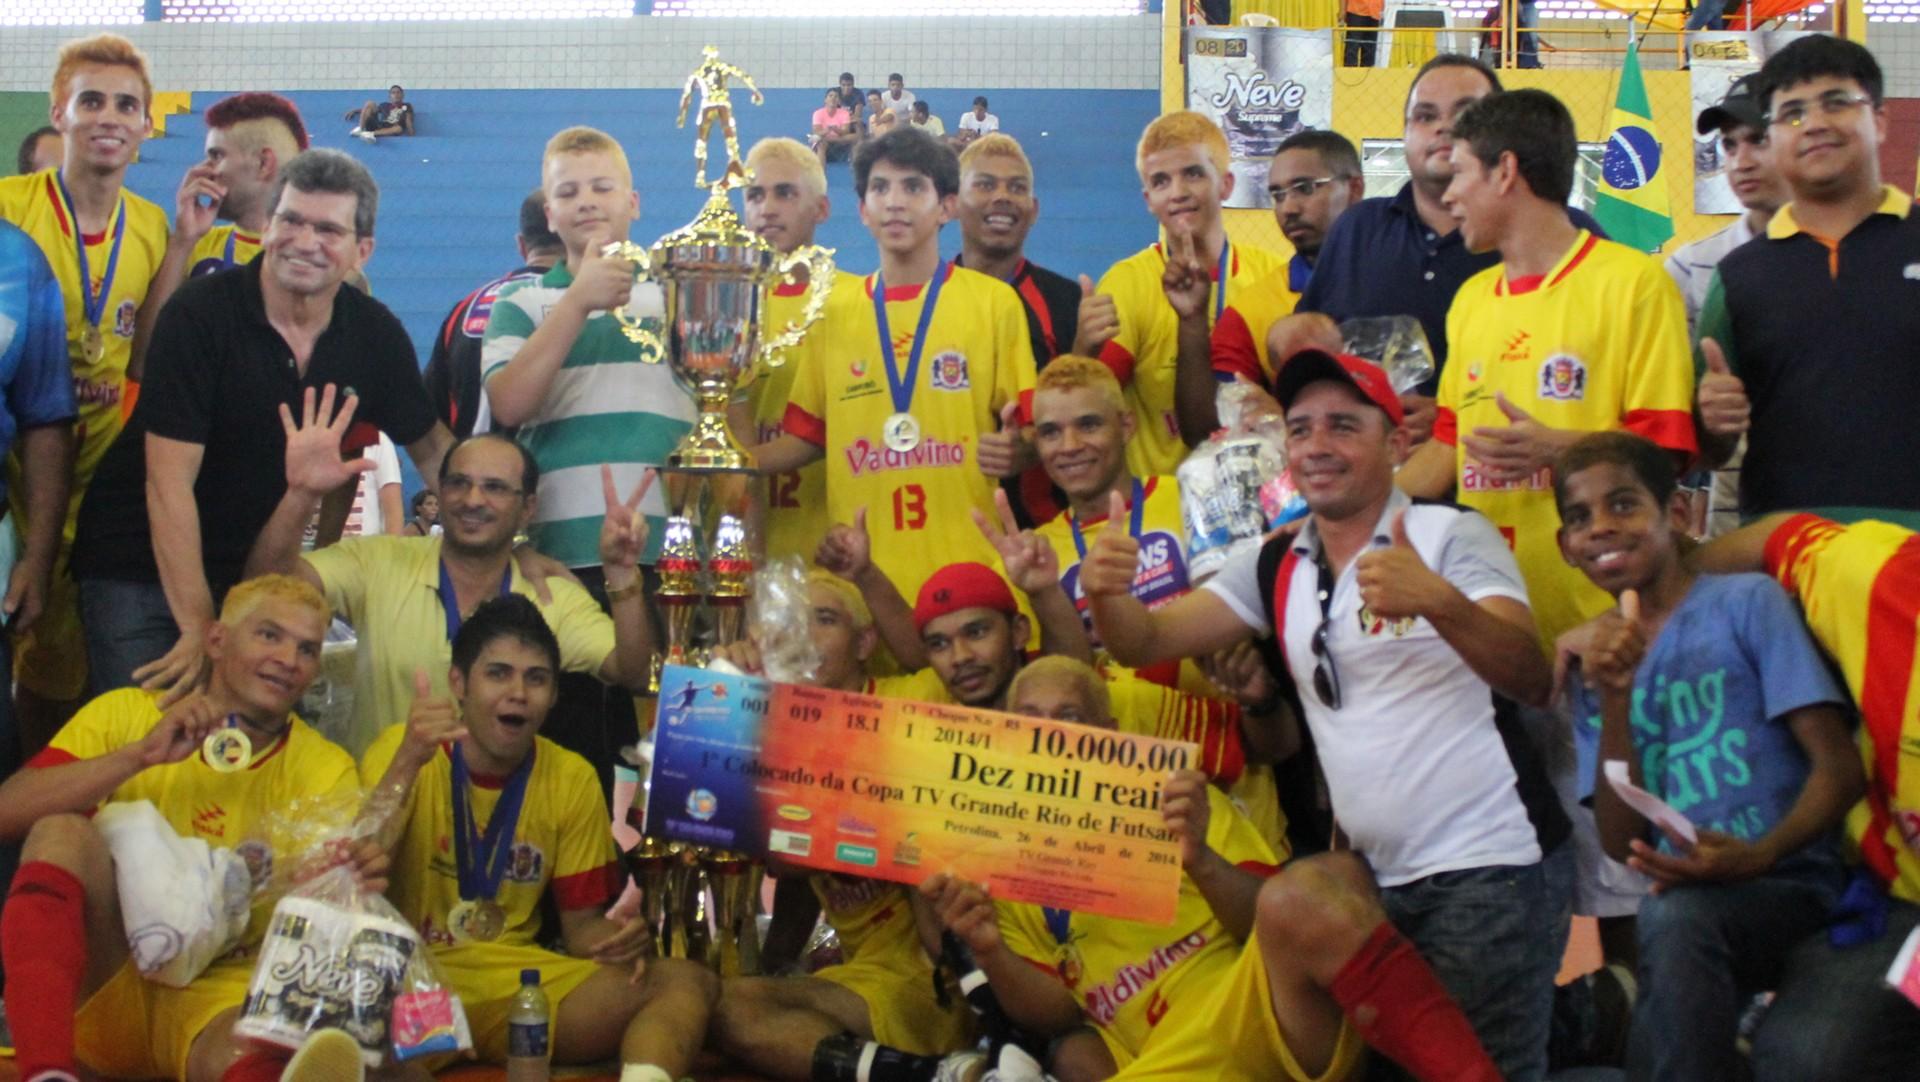 Cabrobó venceu a 18ª Copa Tv Grande Rio de Futsal (Foto: Emerson Rocha)